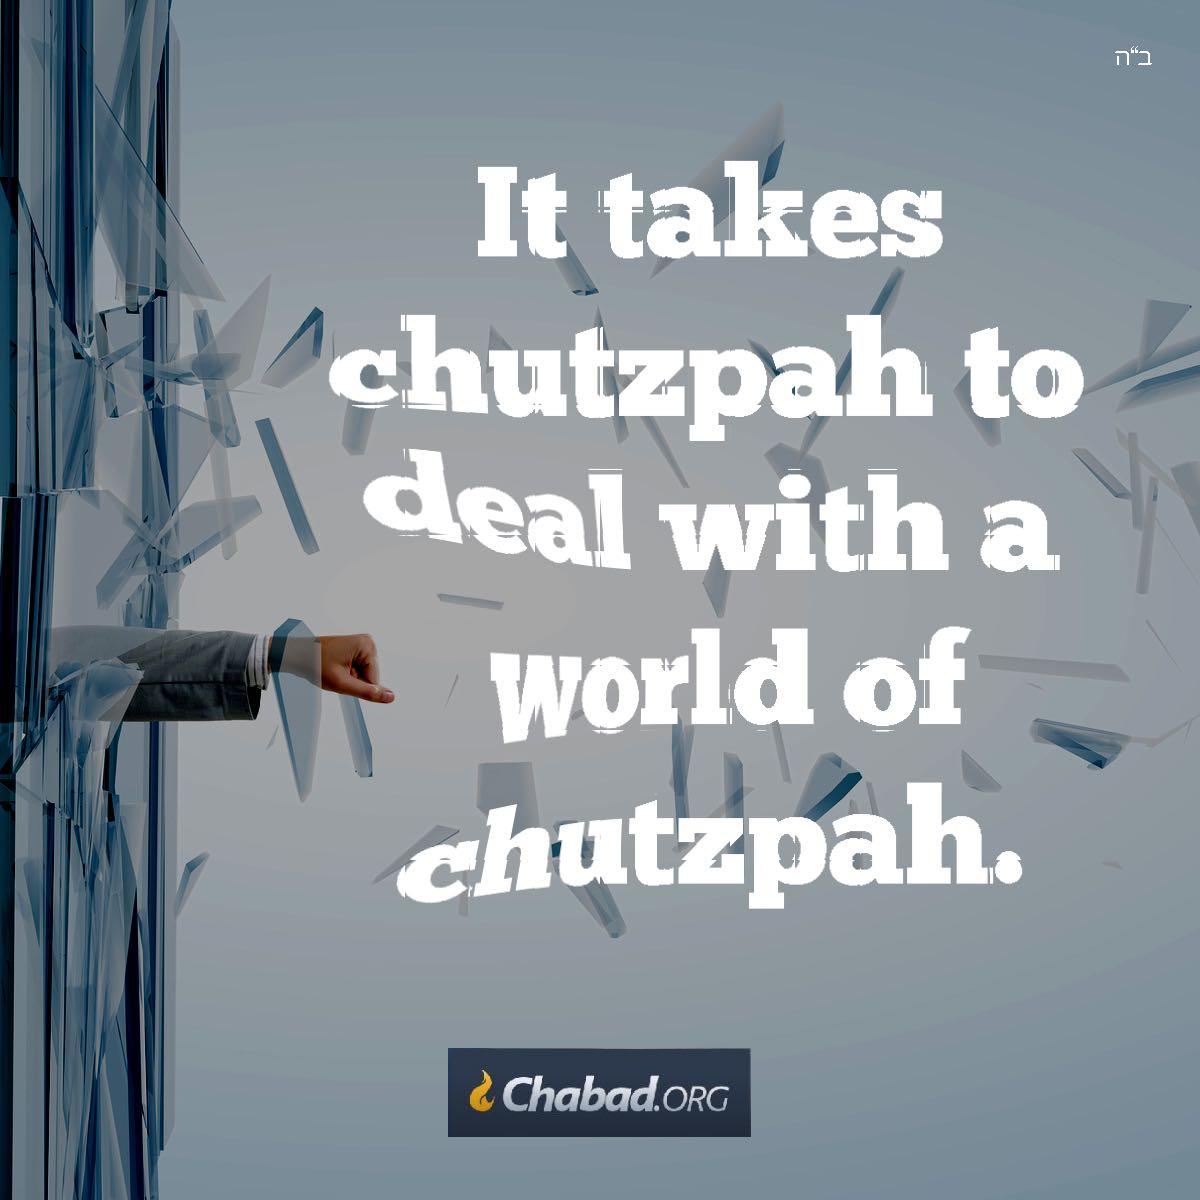 Chutzpah Daily Dose Of Wisdom